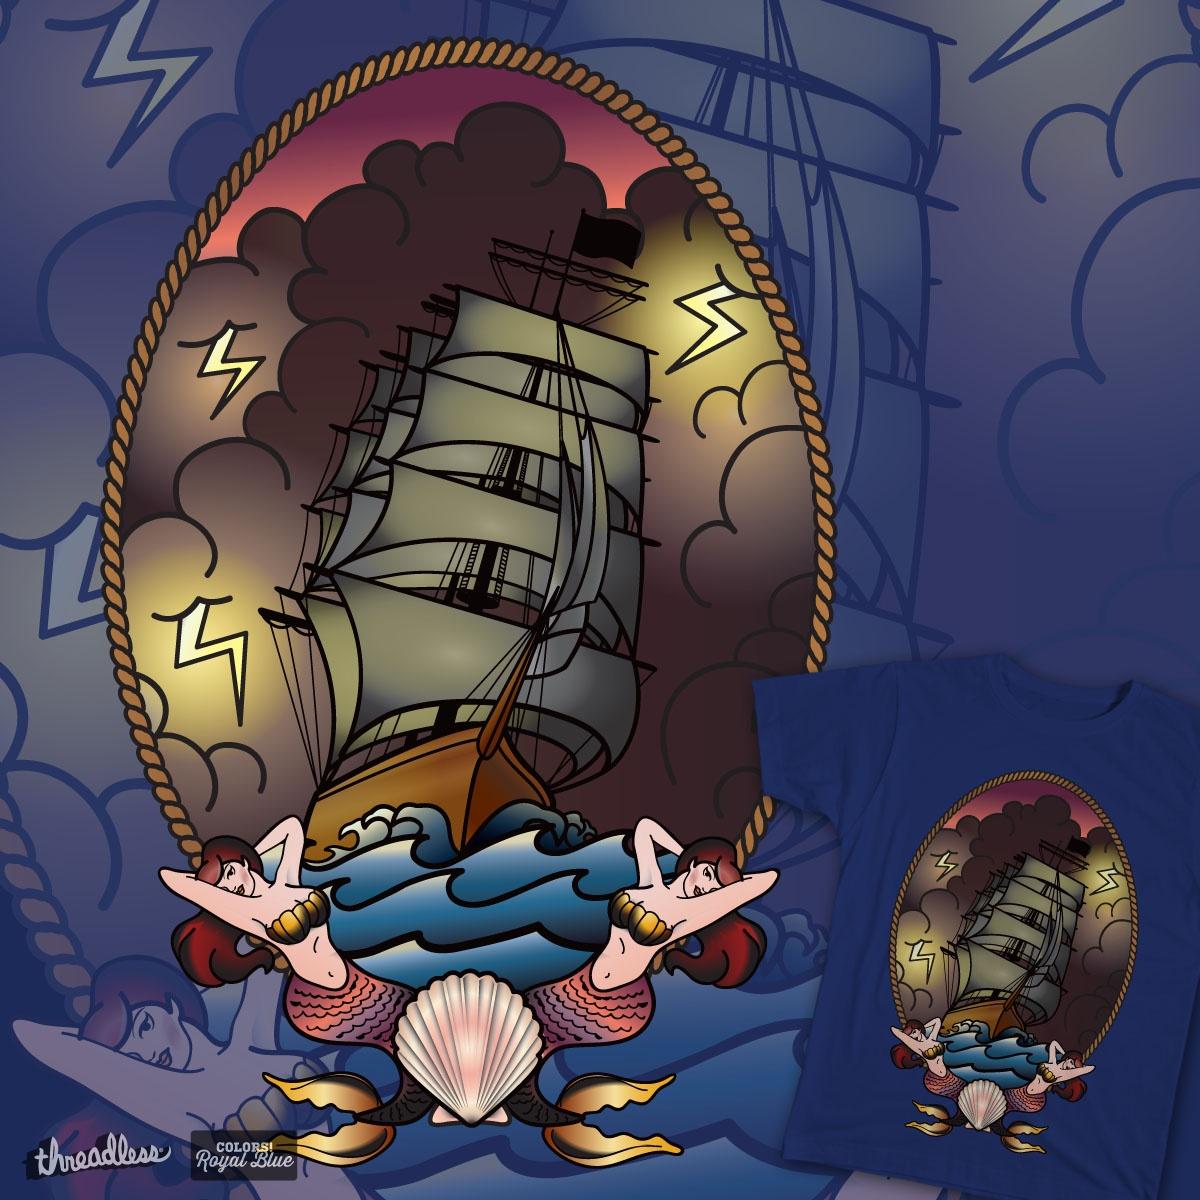 Mermaid Voyage by BrittneyLawrence on Threadless